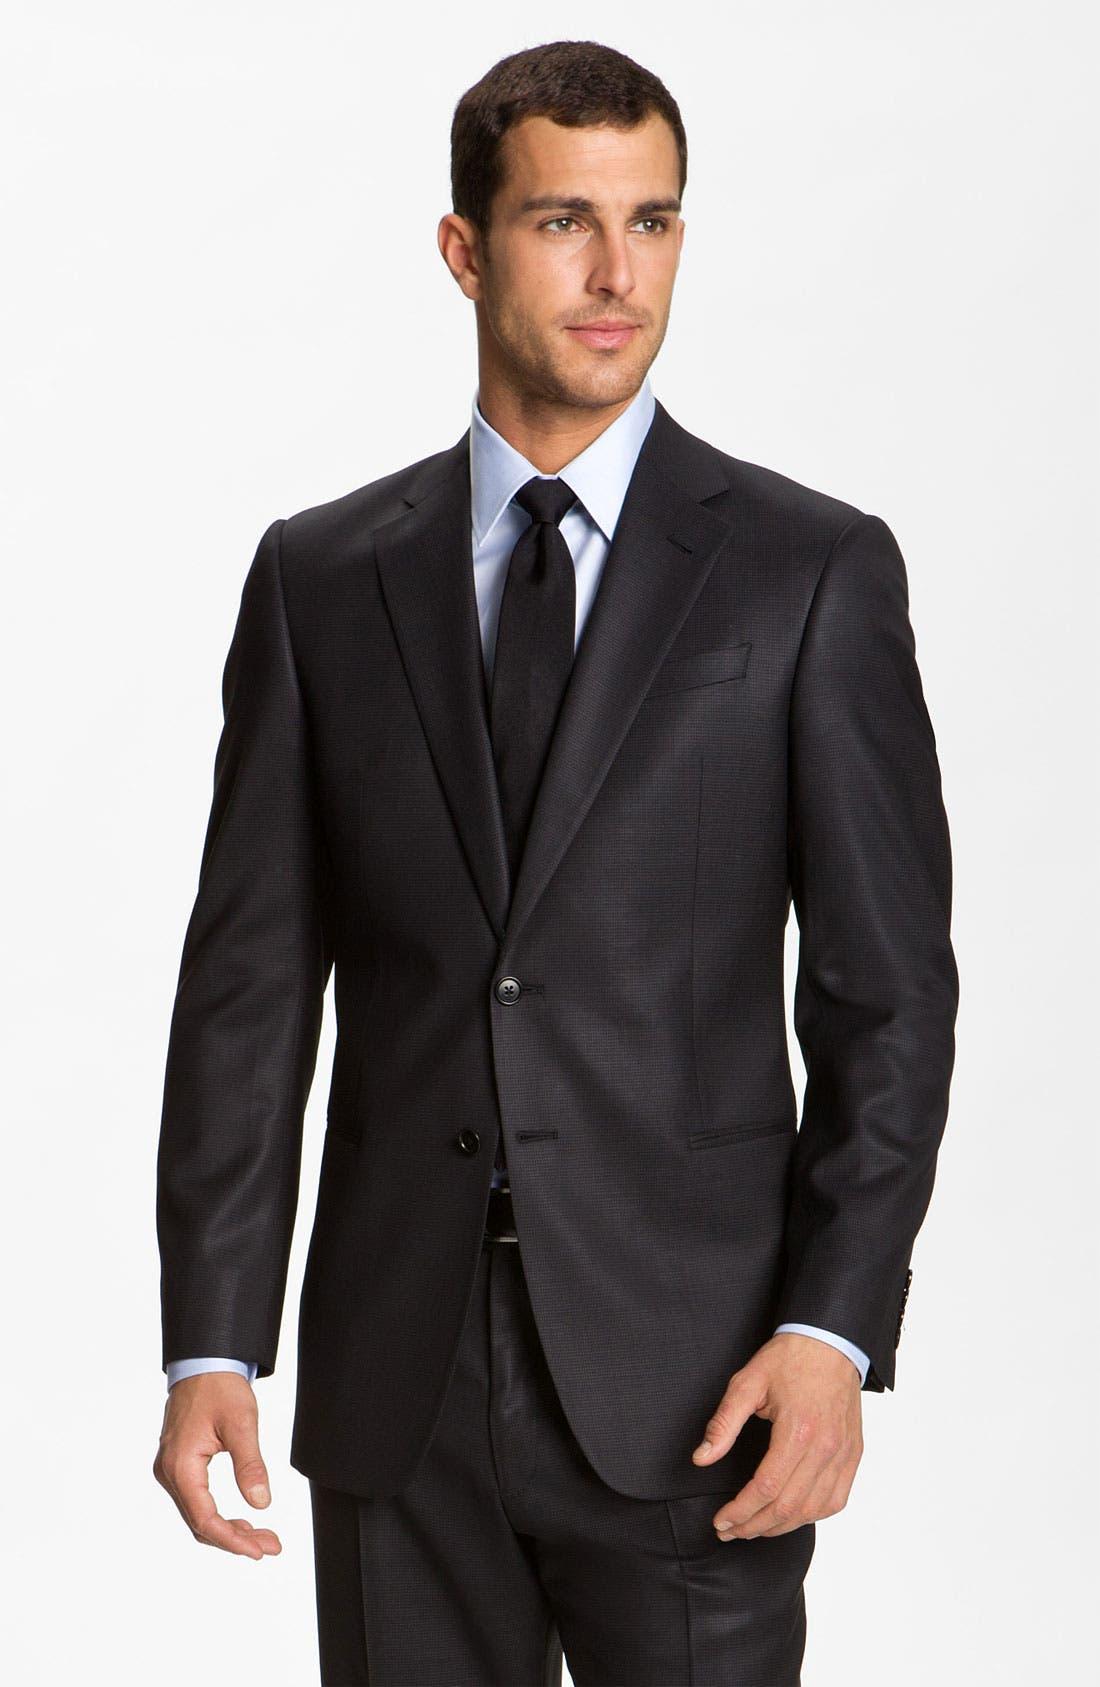 Main Image - Armani Collezioni 'Giorgio' Trim Fit Wool Suit